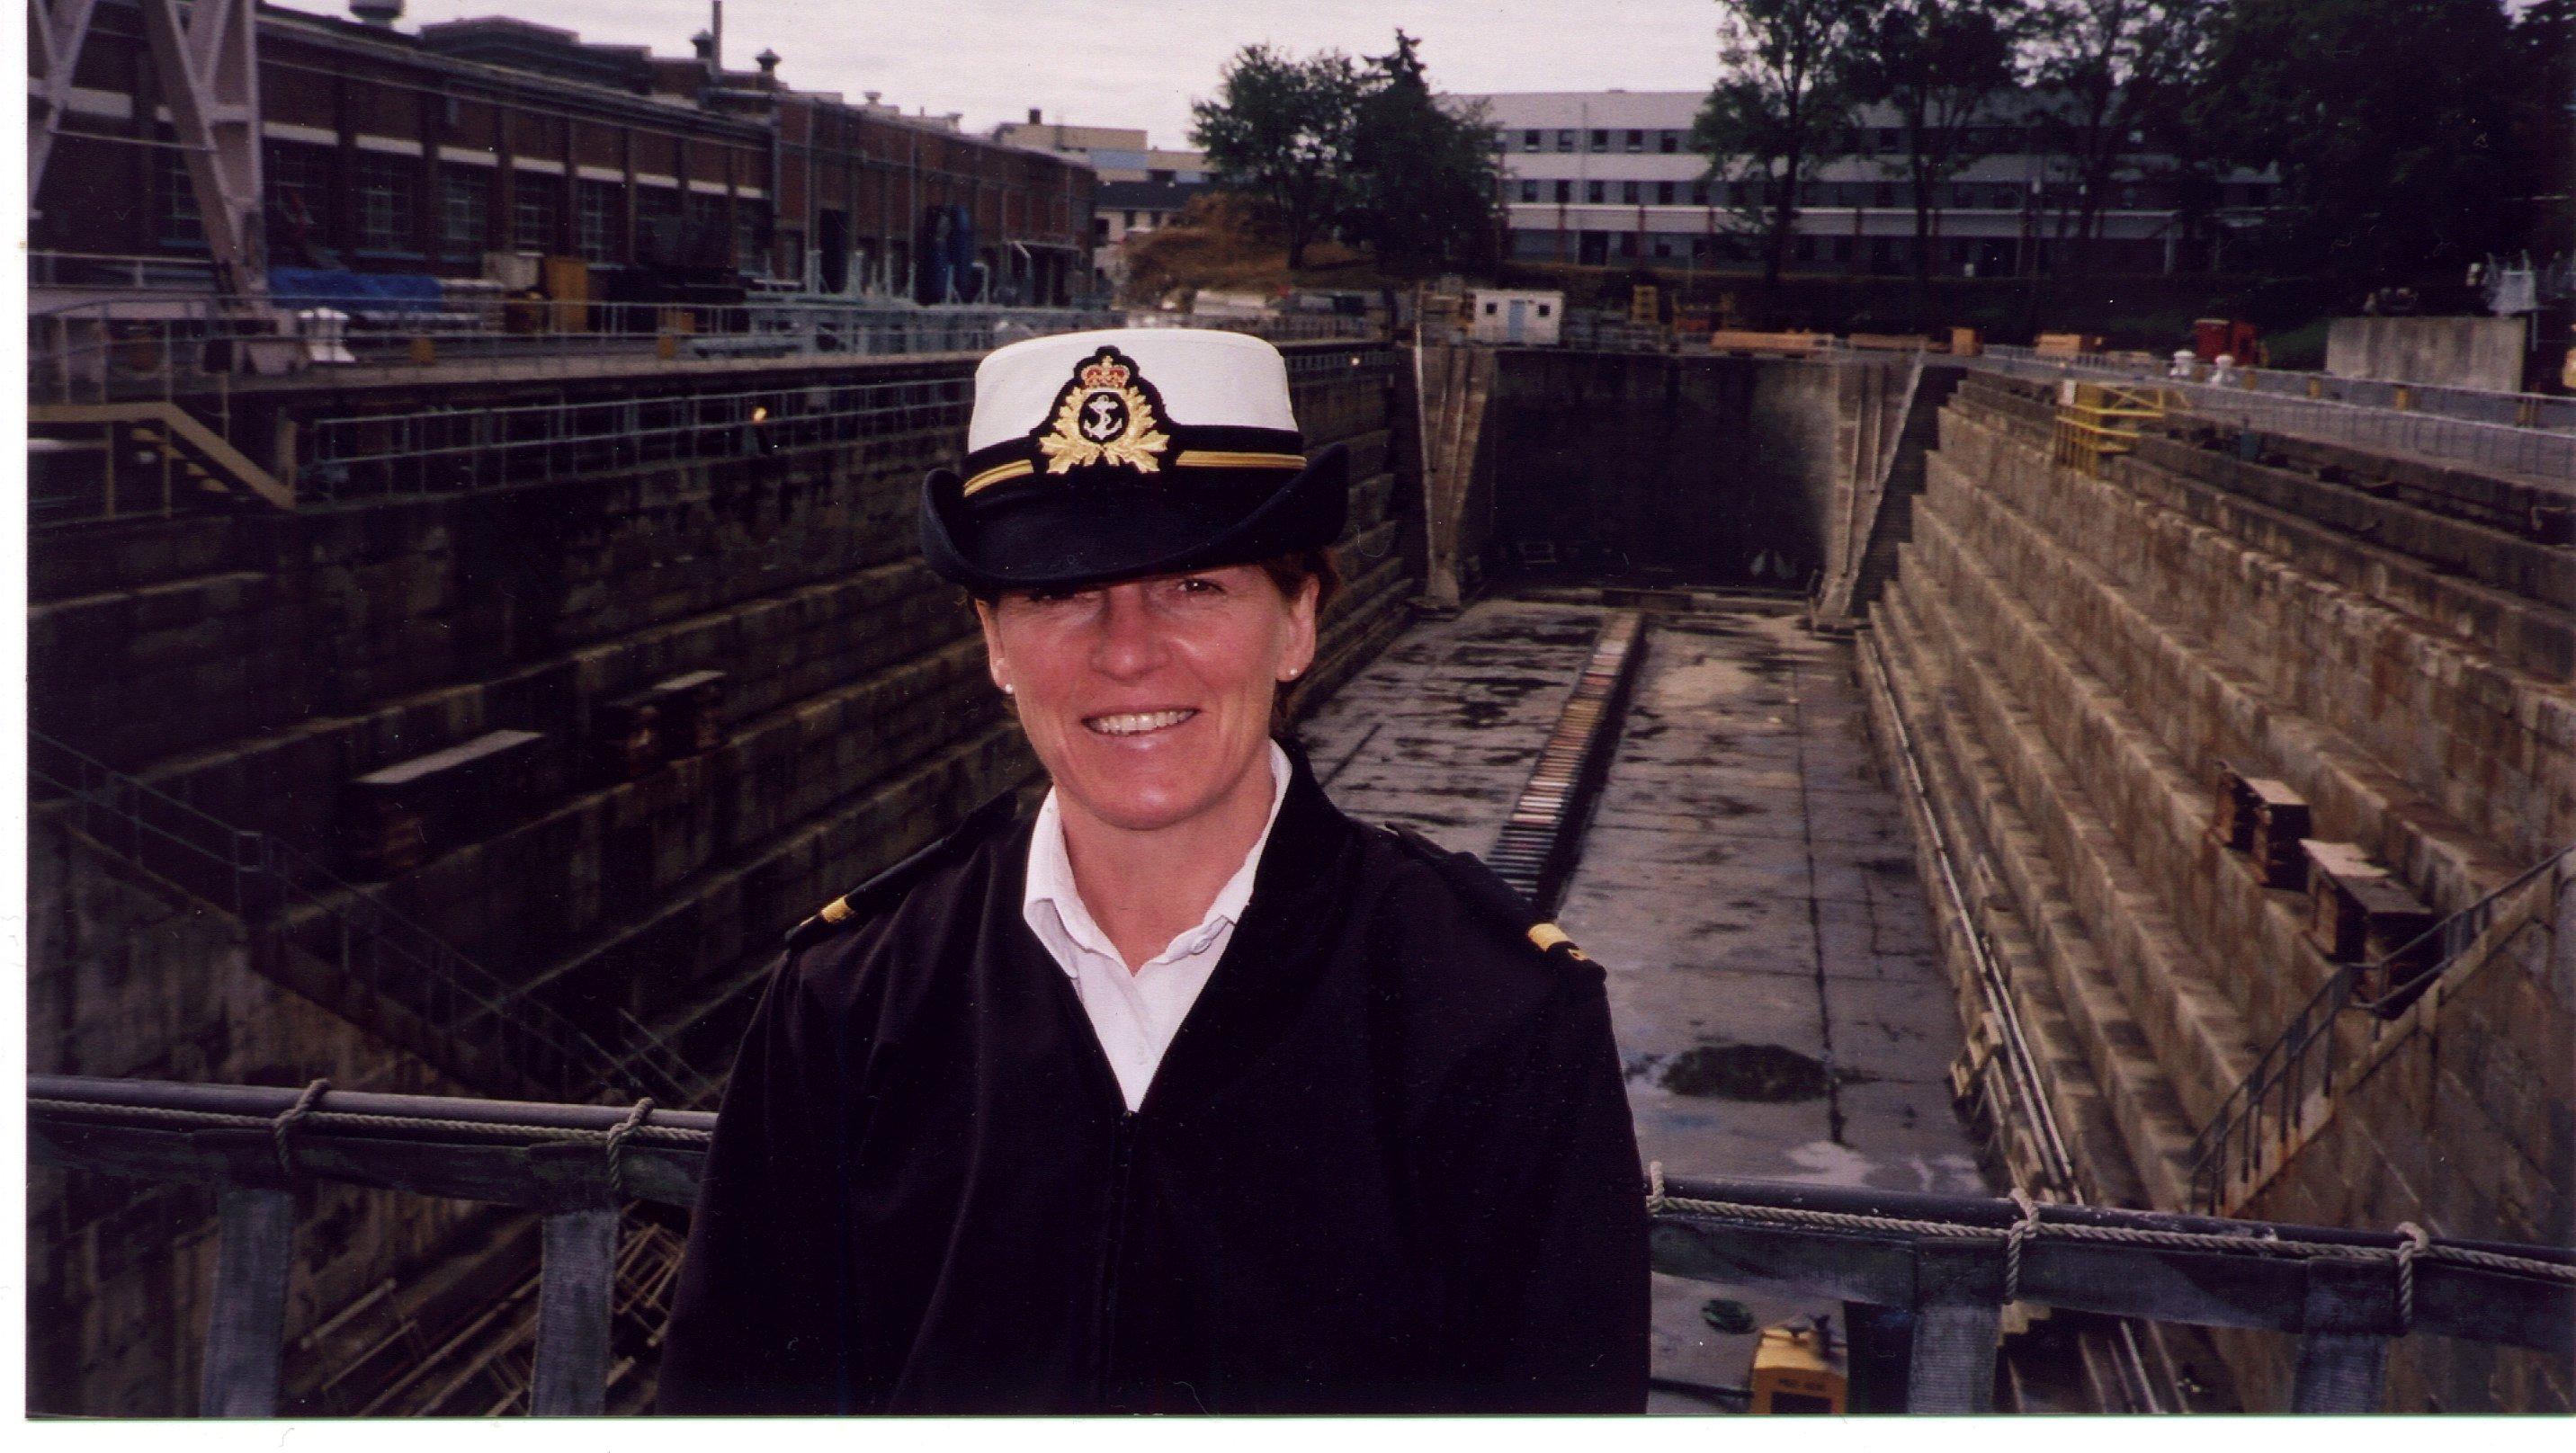 A/SLt Graham HMC Dockyard Eaquimalt 2002